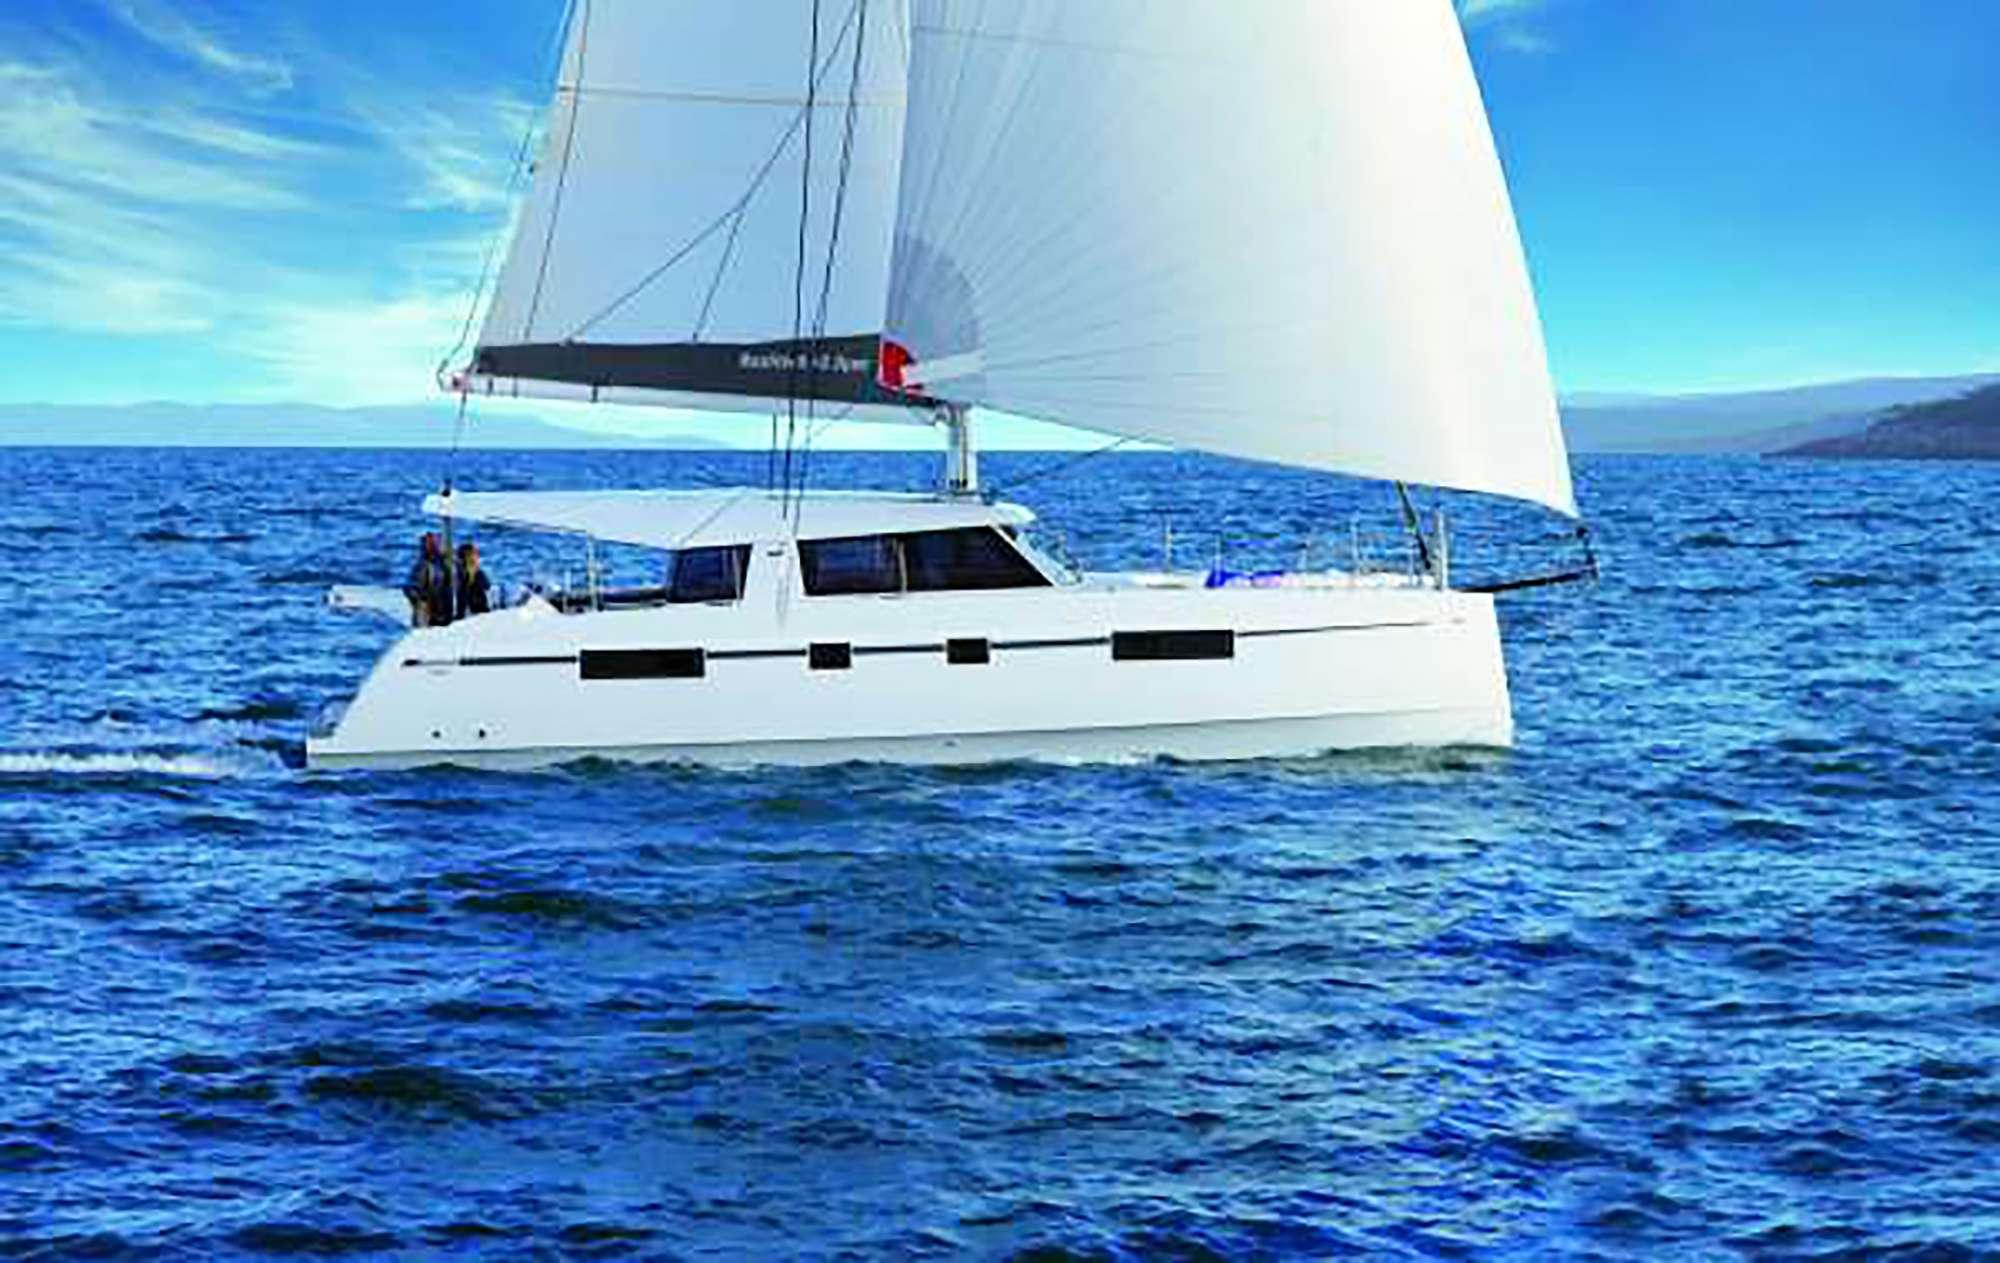 Enjoy sailing in the Caribbean!